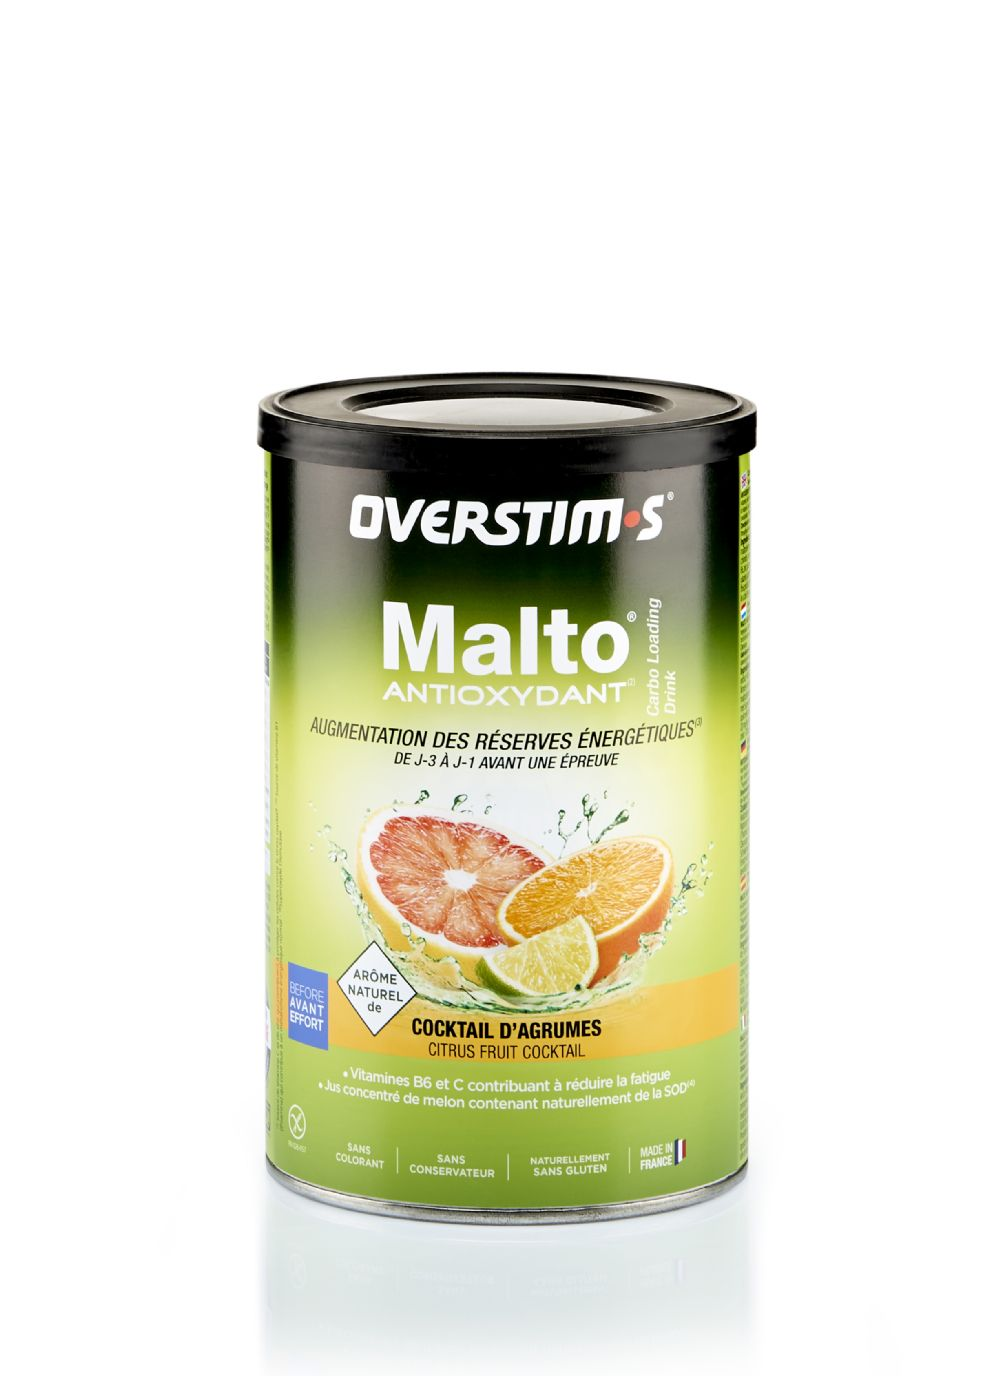 MALTO ANTIOXYDANT CÍTRICOS 500gr